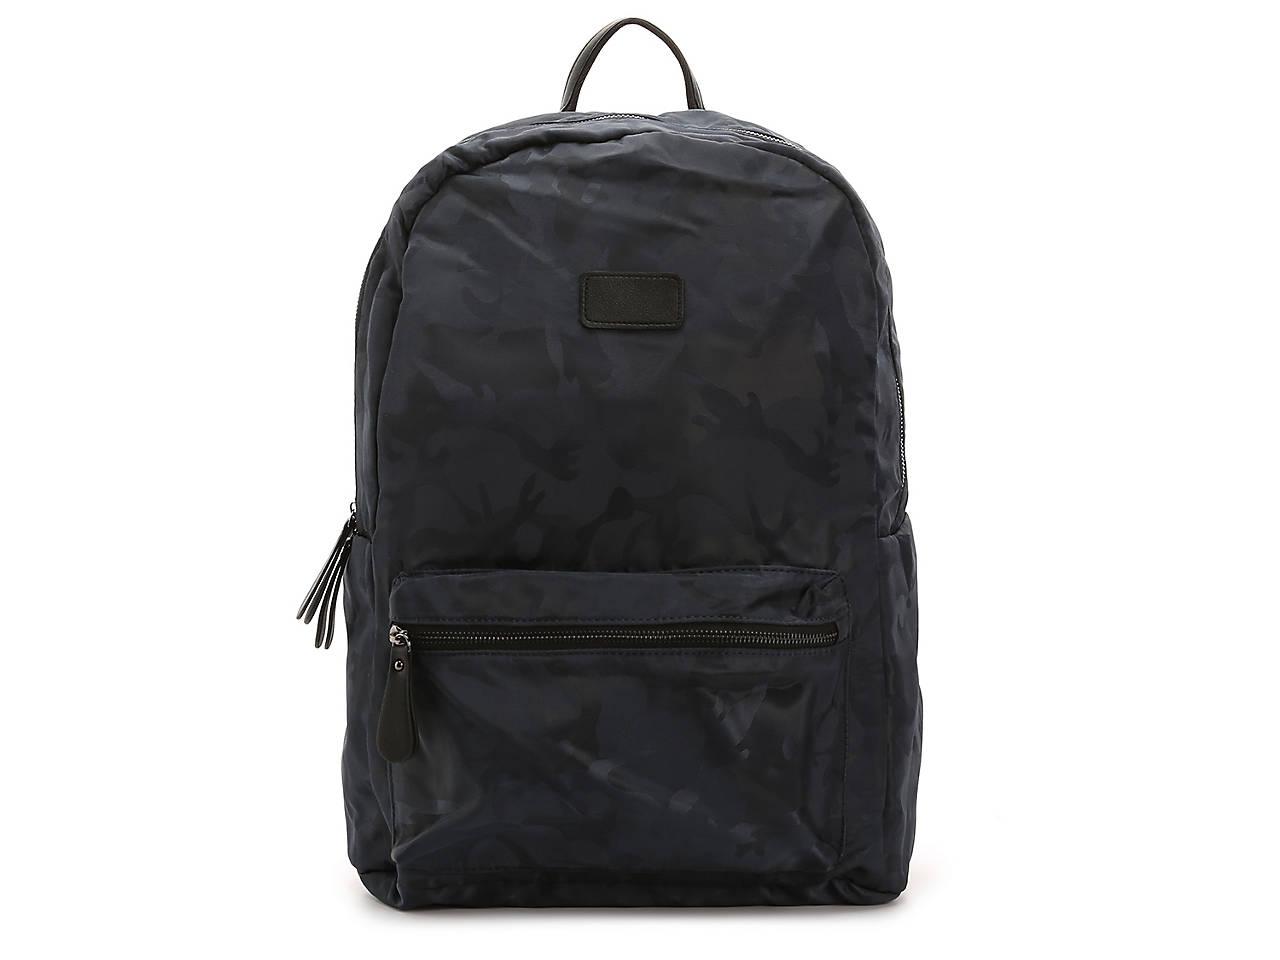 b8db49f74 Seven 91 Camo Backpack Men's Handbags & Accessories   DSW